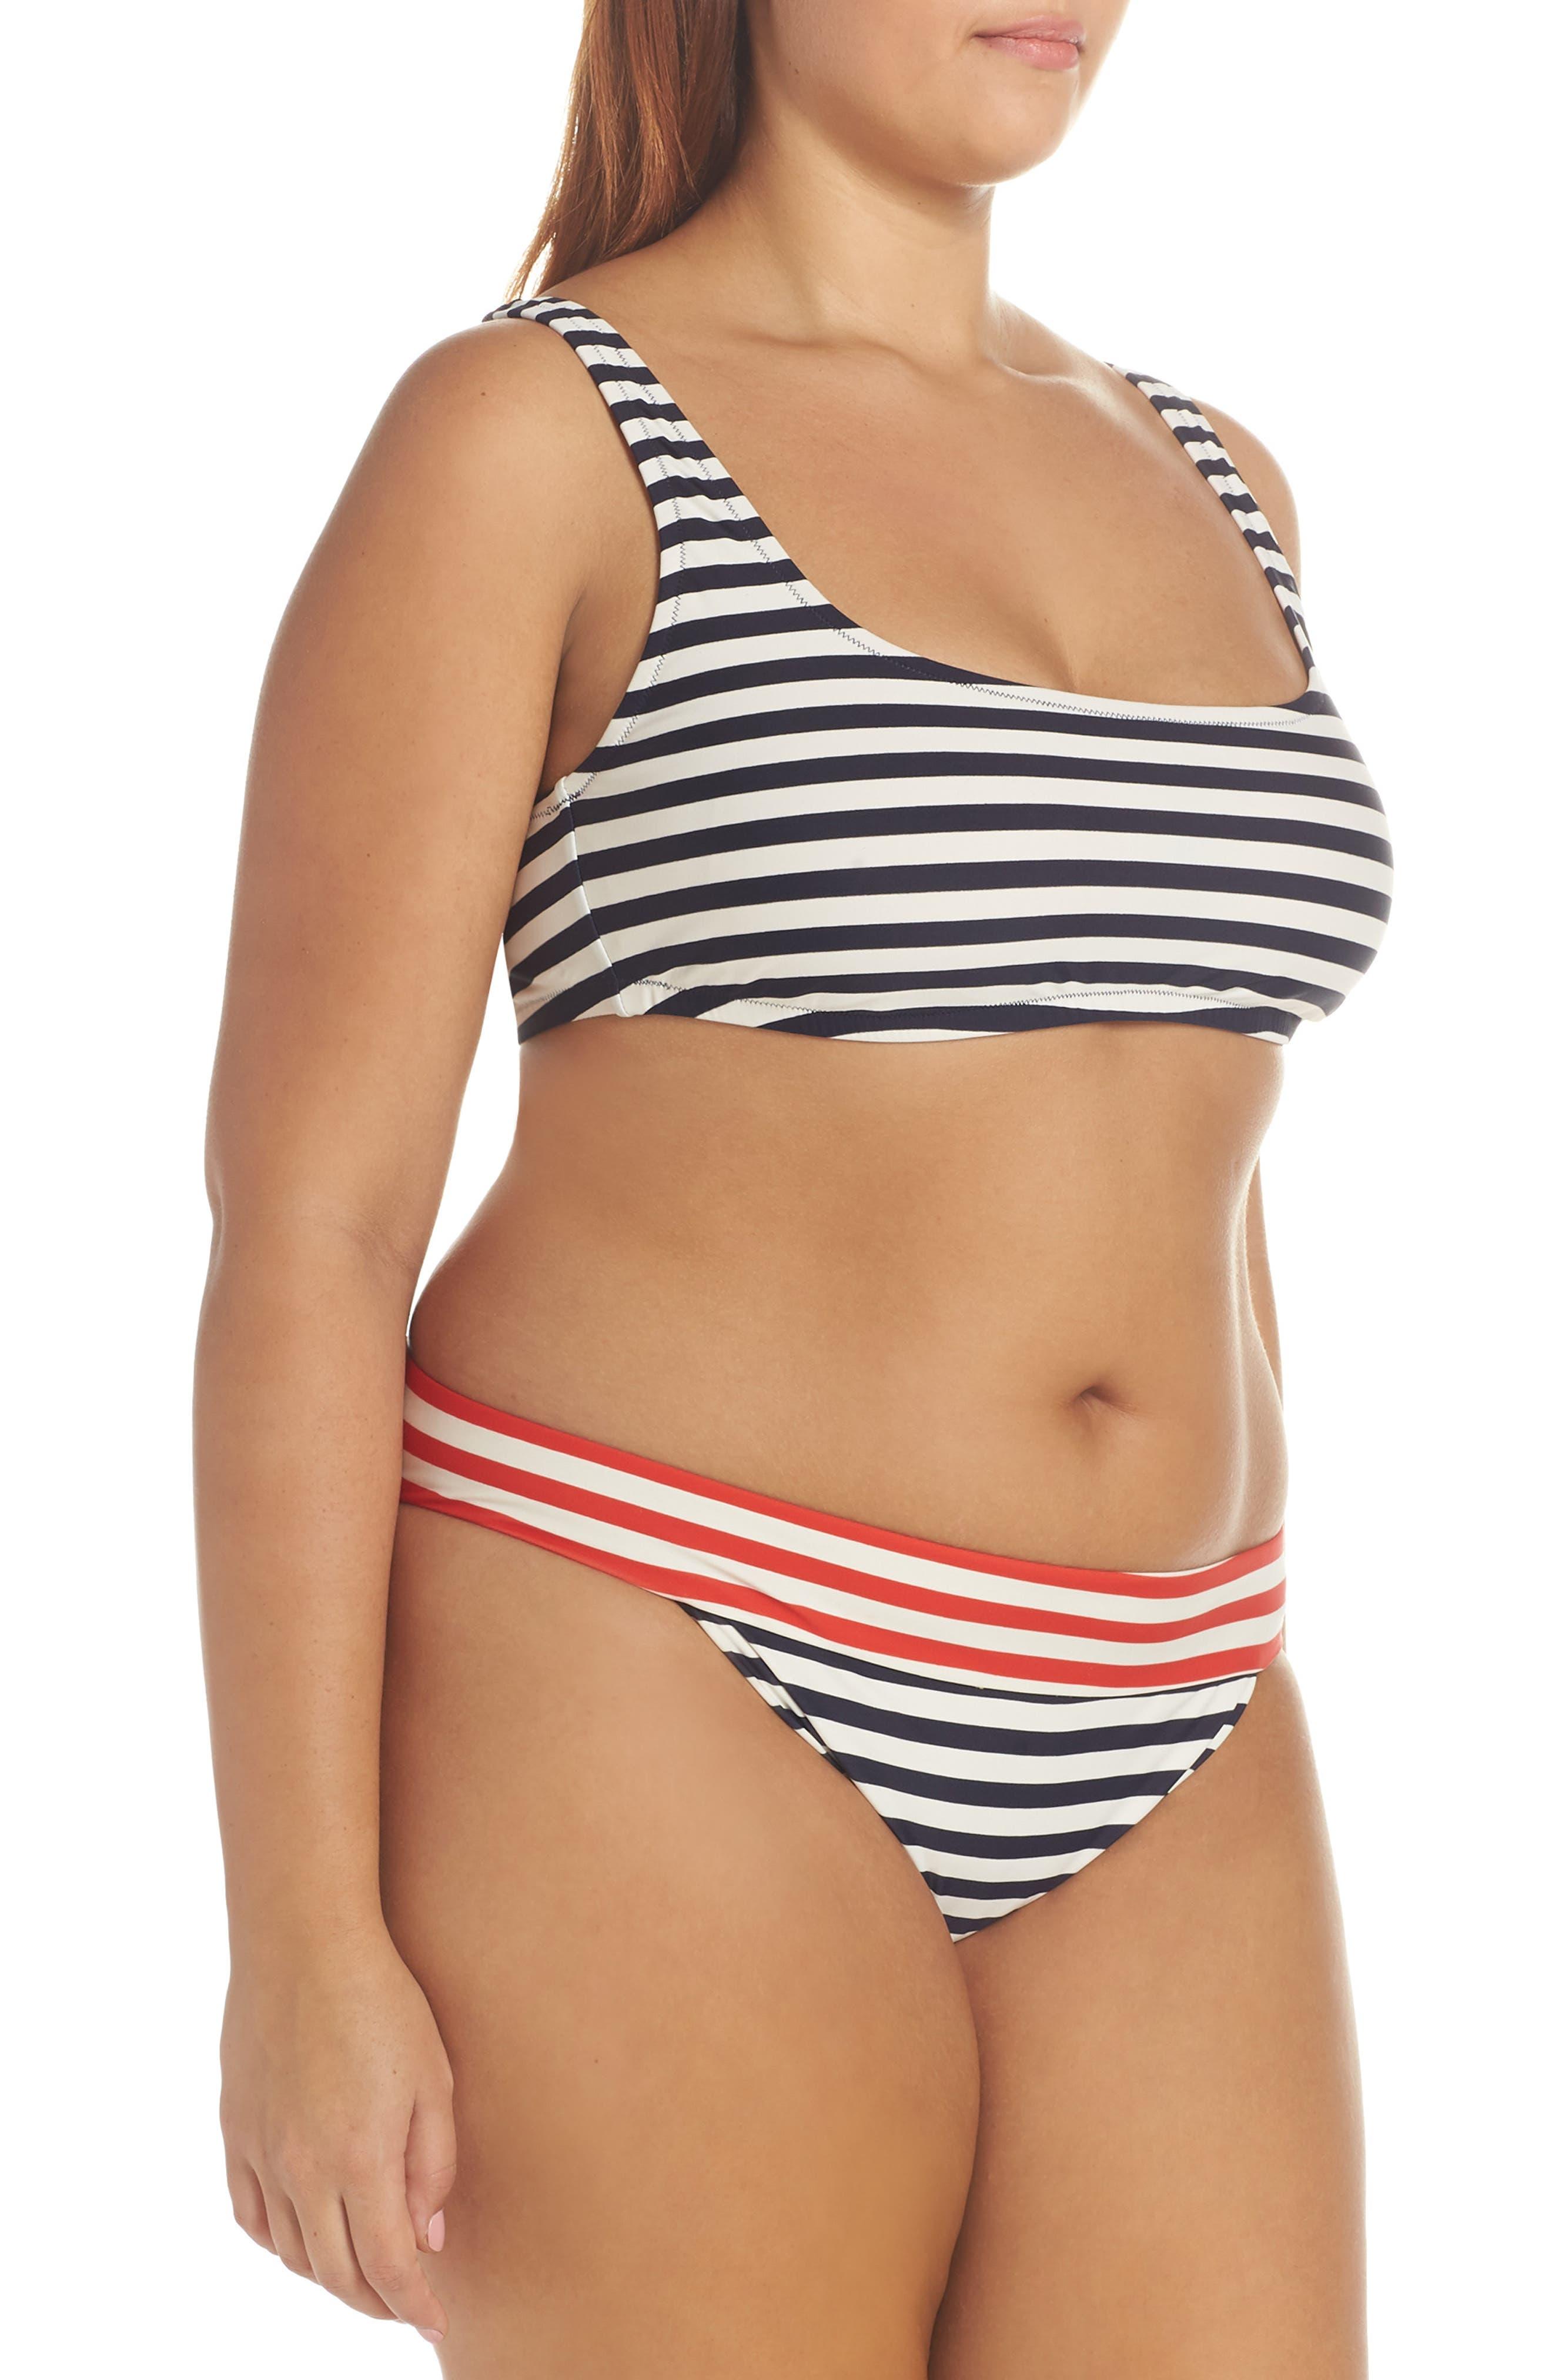 Stripe Banded Bikini Bottoms,                             Alternate thumbnail 9, color,                             NAVY VIVID FLAME